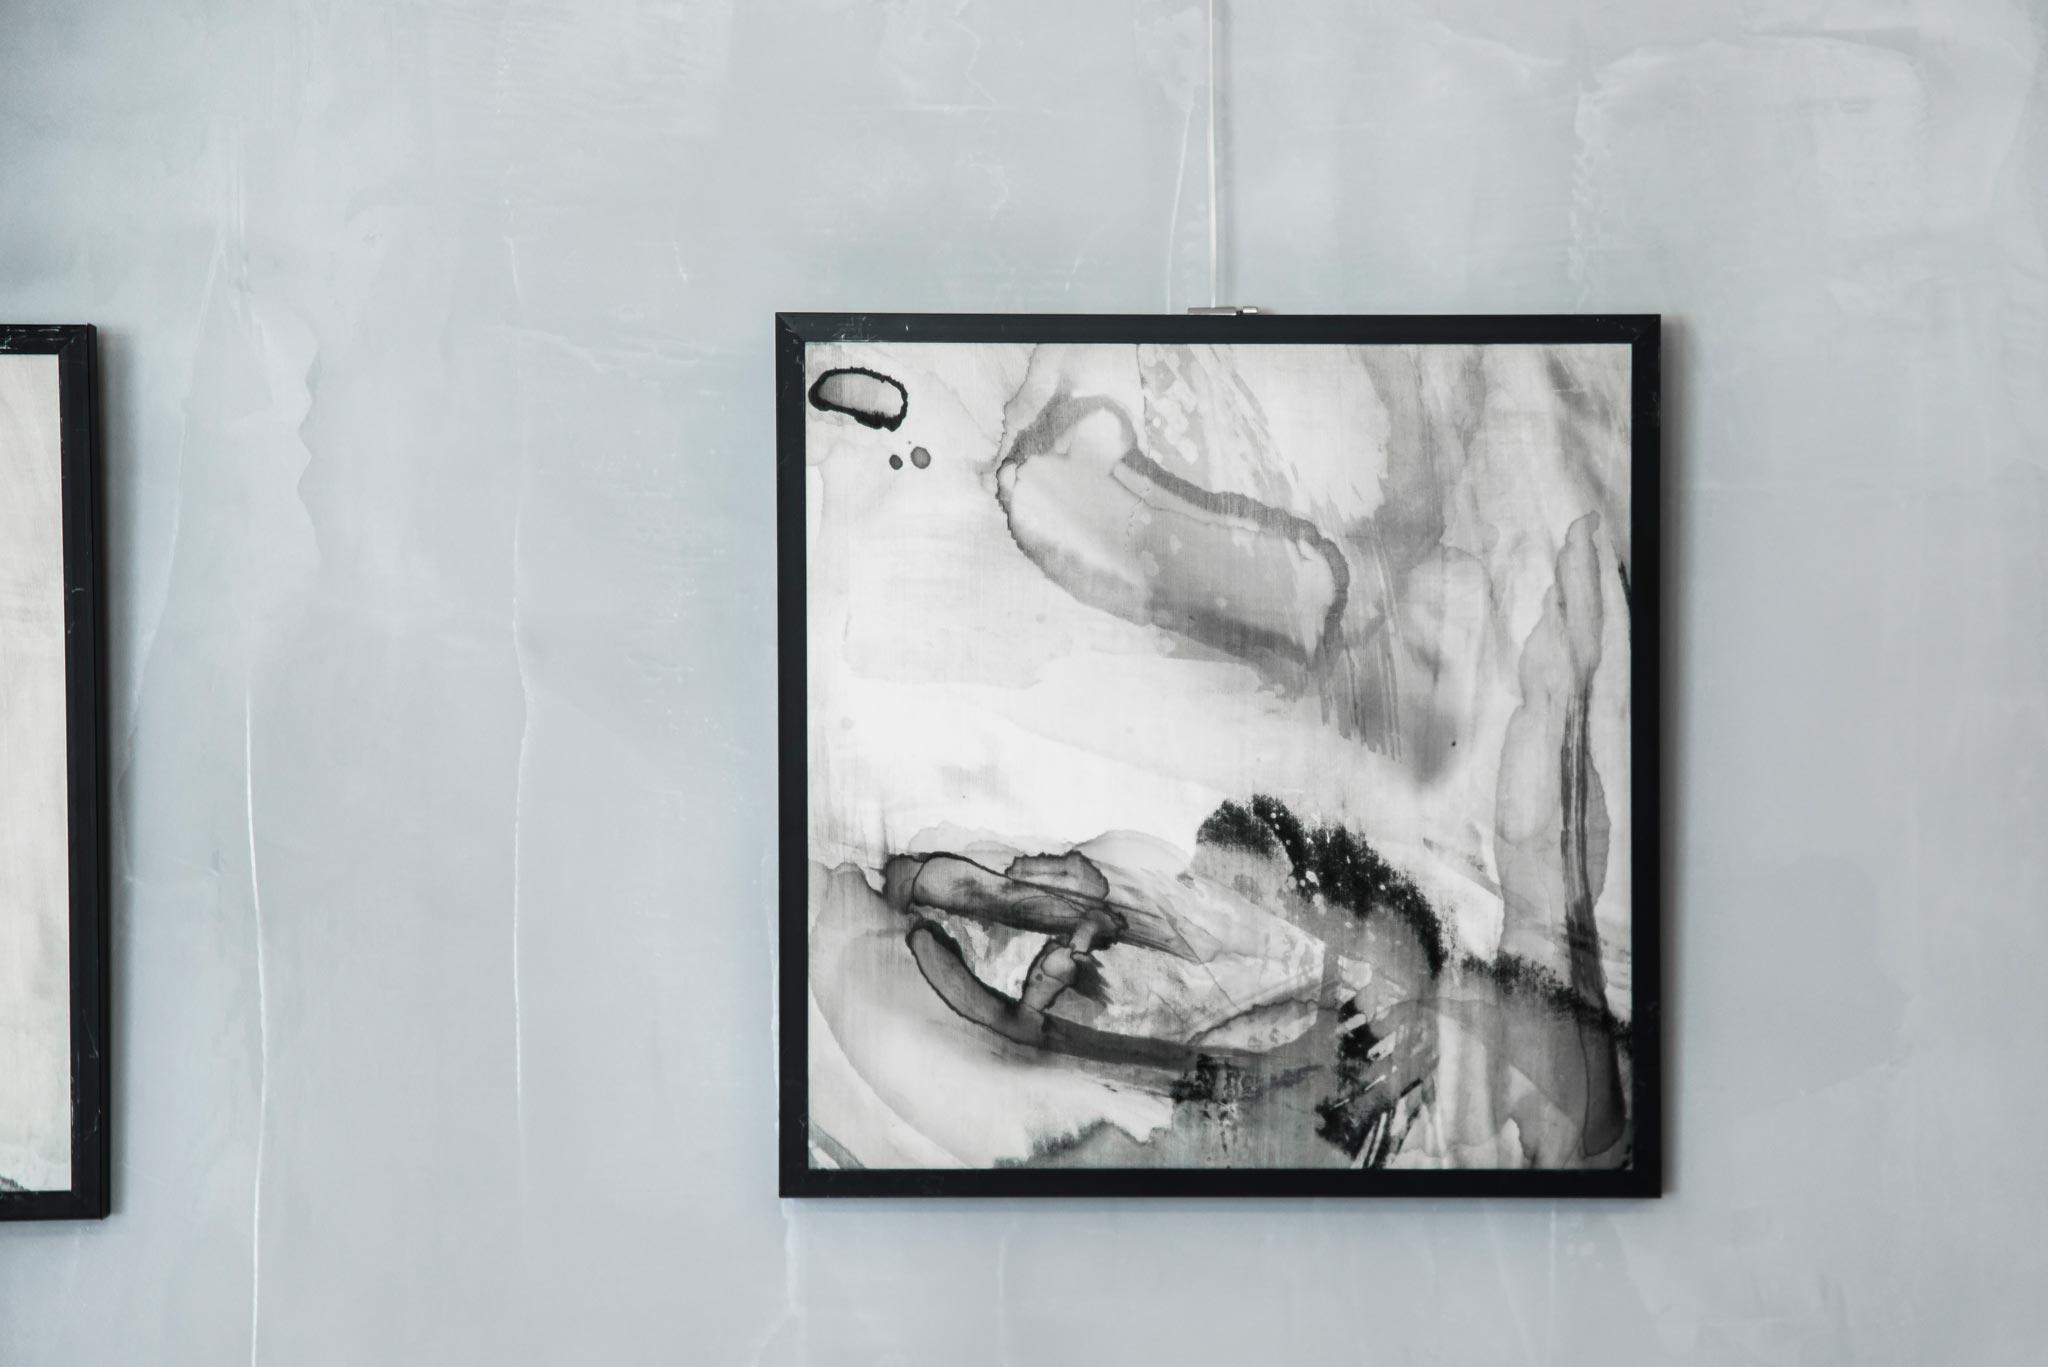 ES BainSaillon 6060 art hor 17 01 024 - ...Suite des bains de saillon